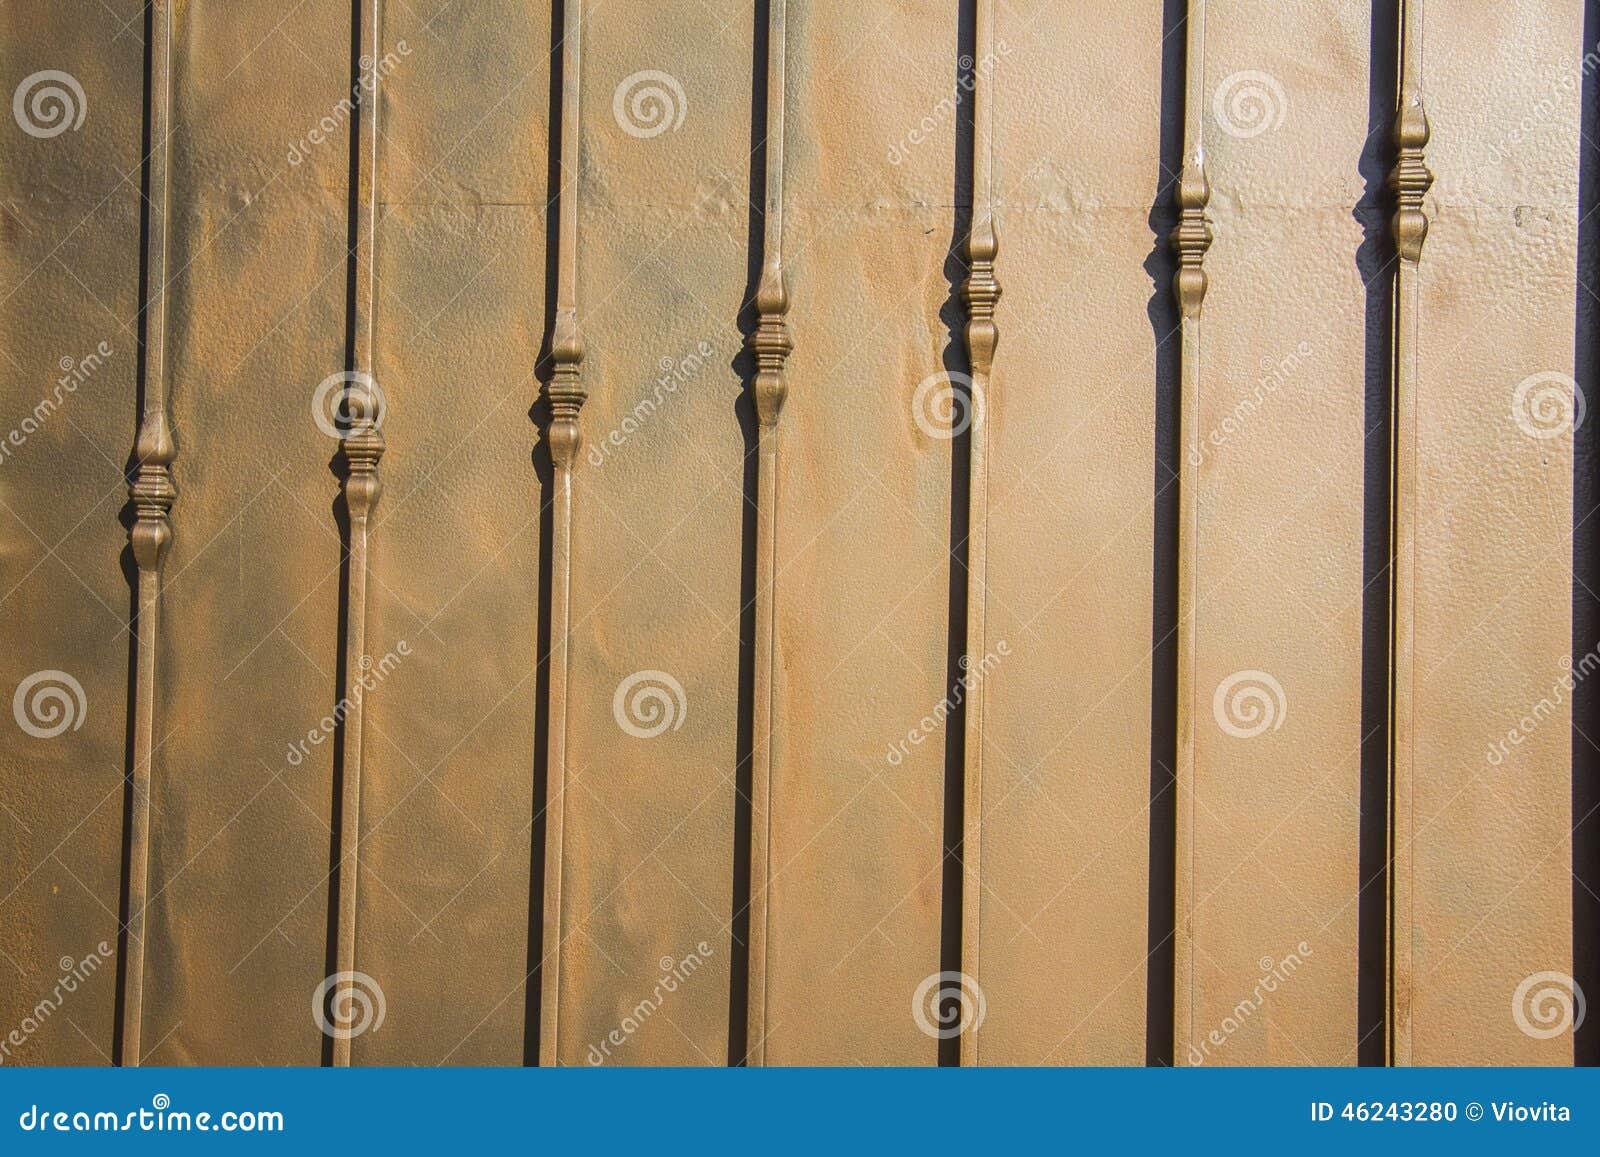 Luxury wrought iron fence detail stock photo for Luxury fences